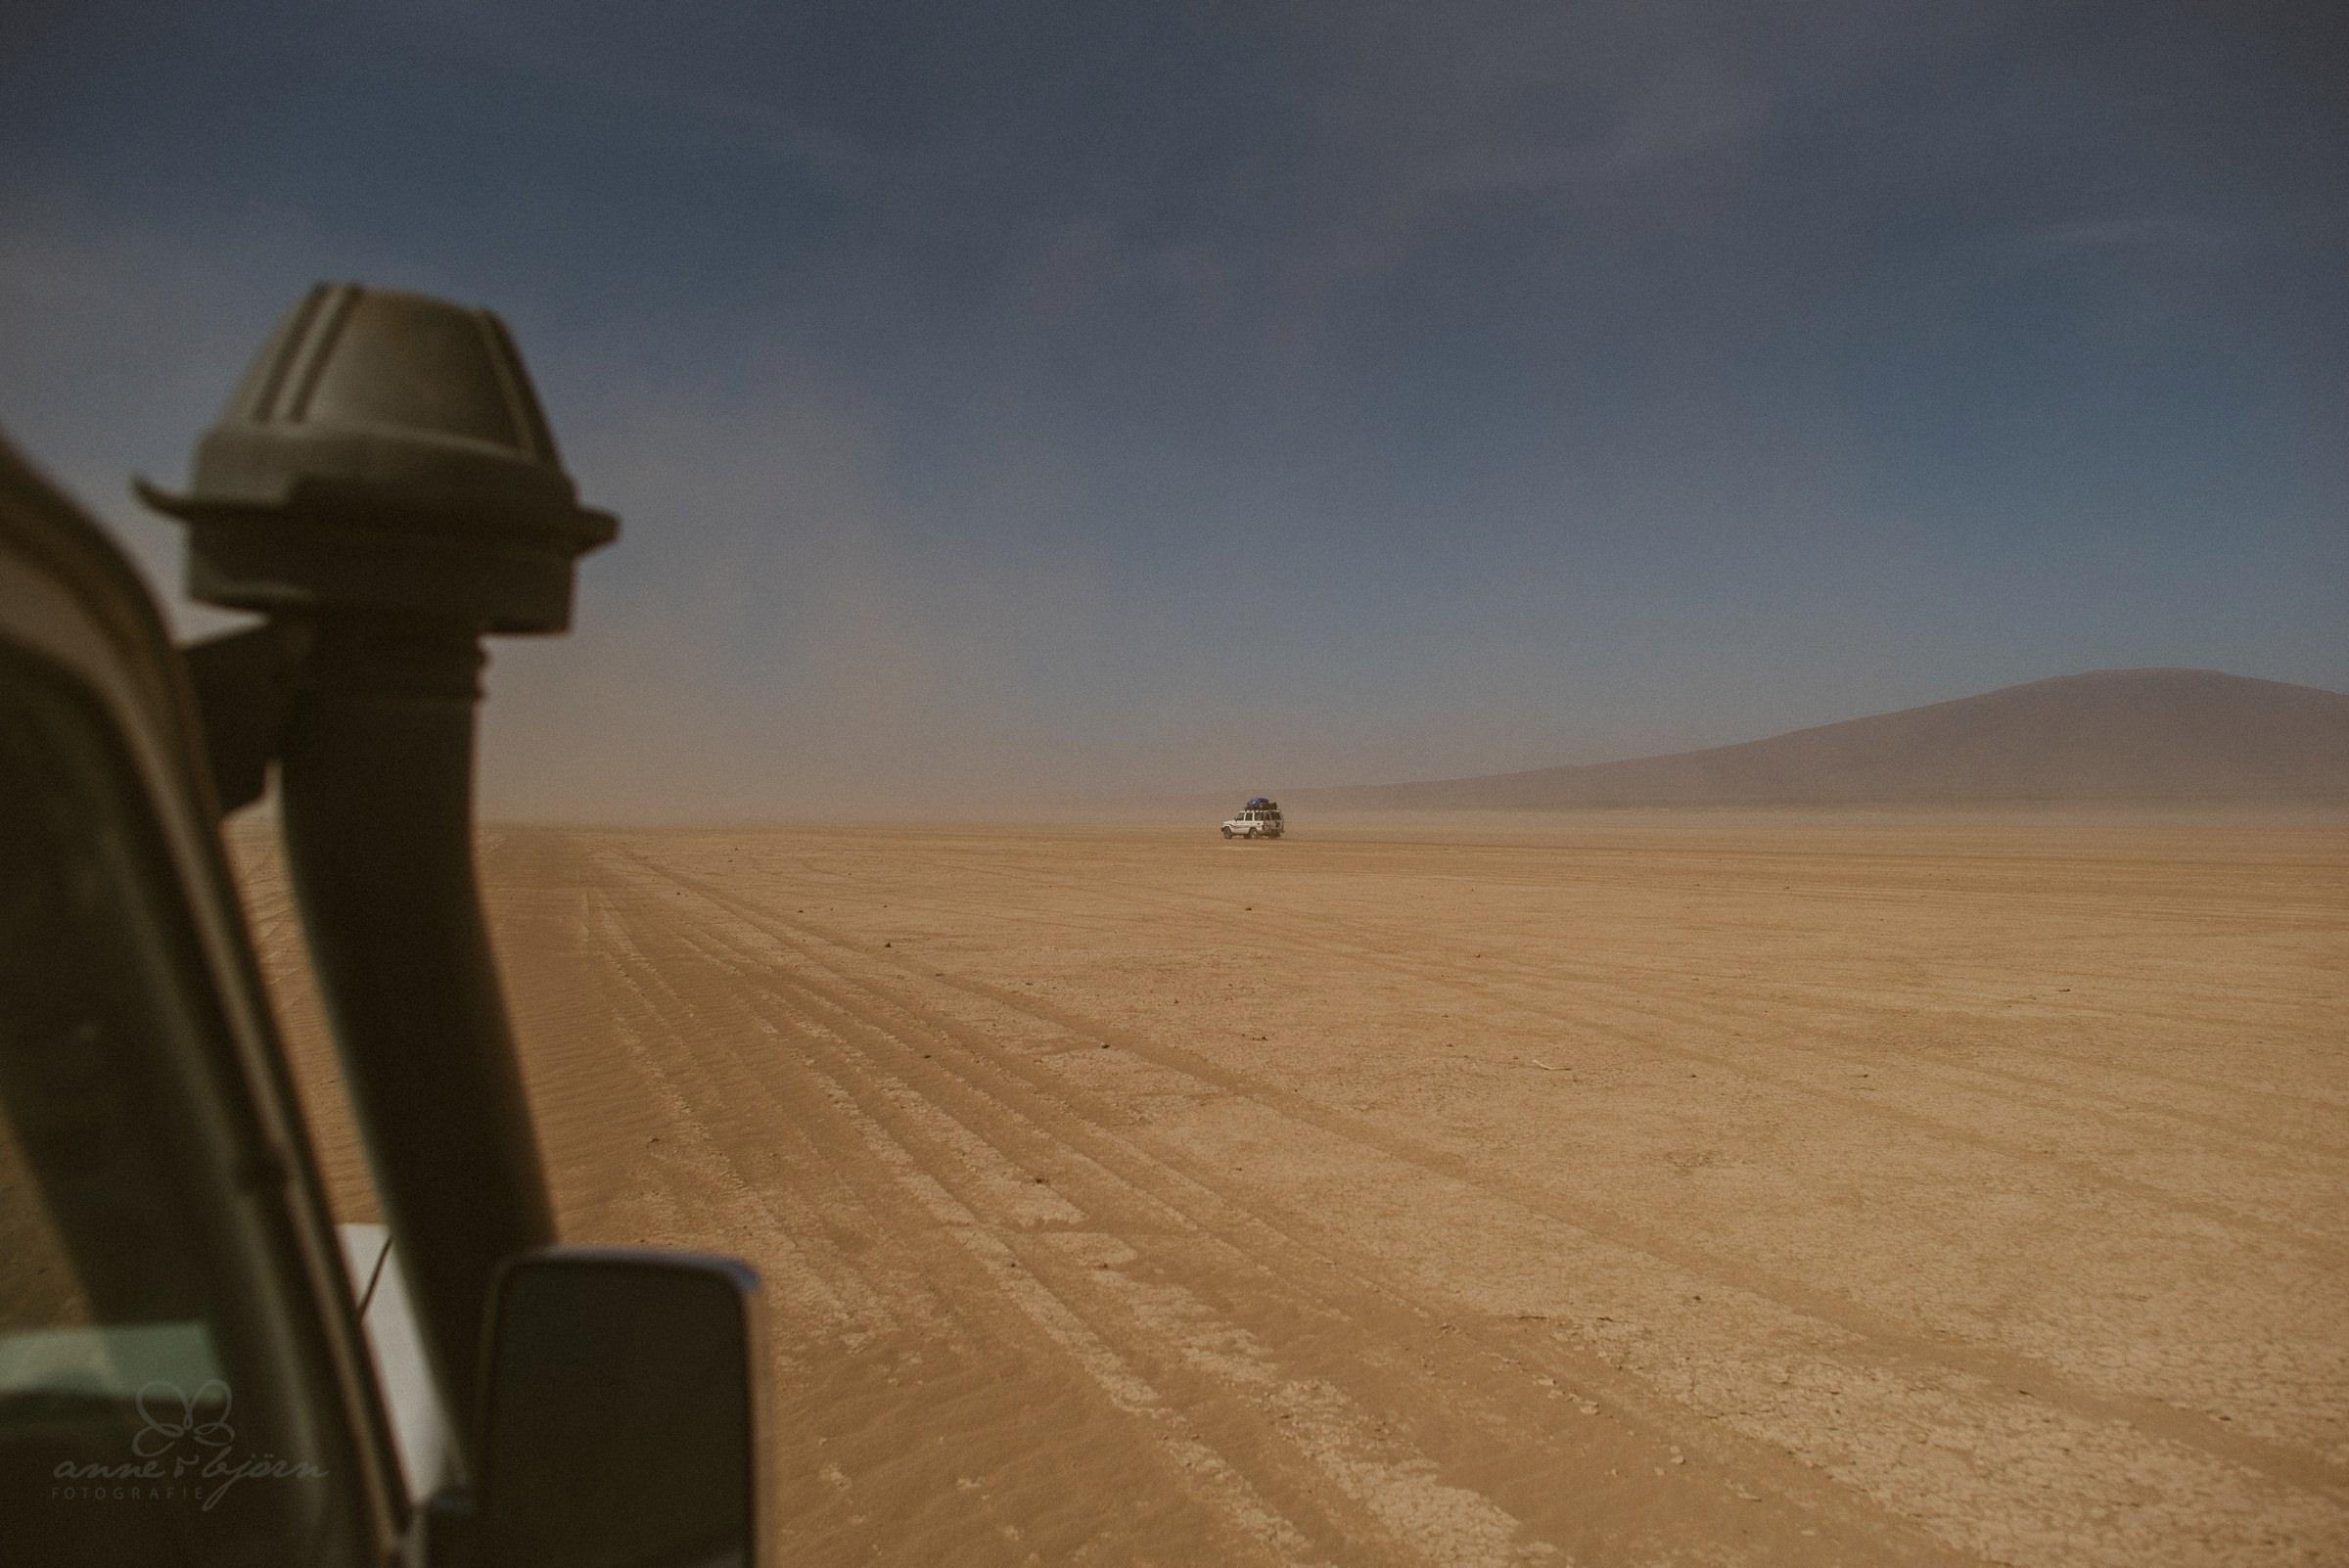 Jeep, Wüstentour, Tour, Sand, Vulkan, Afar Region